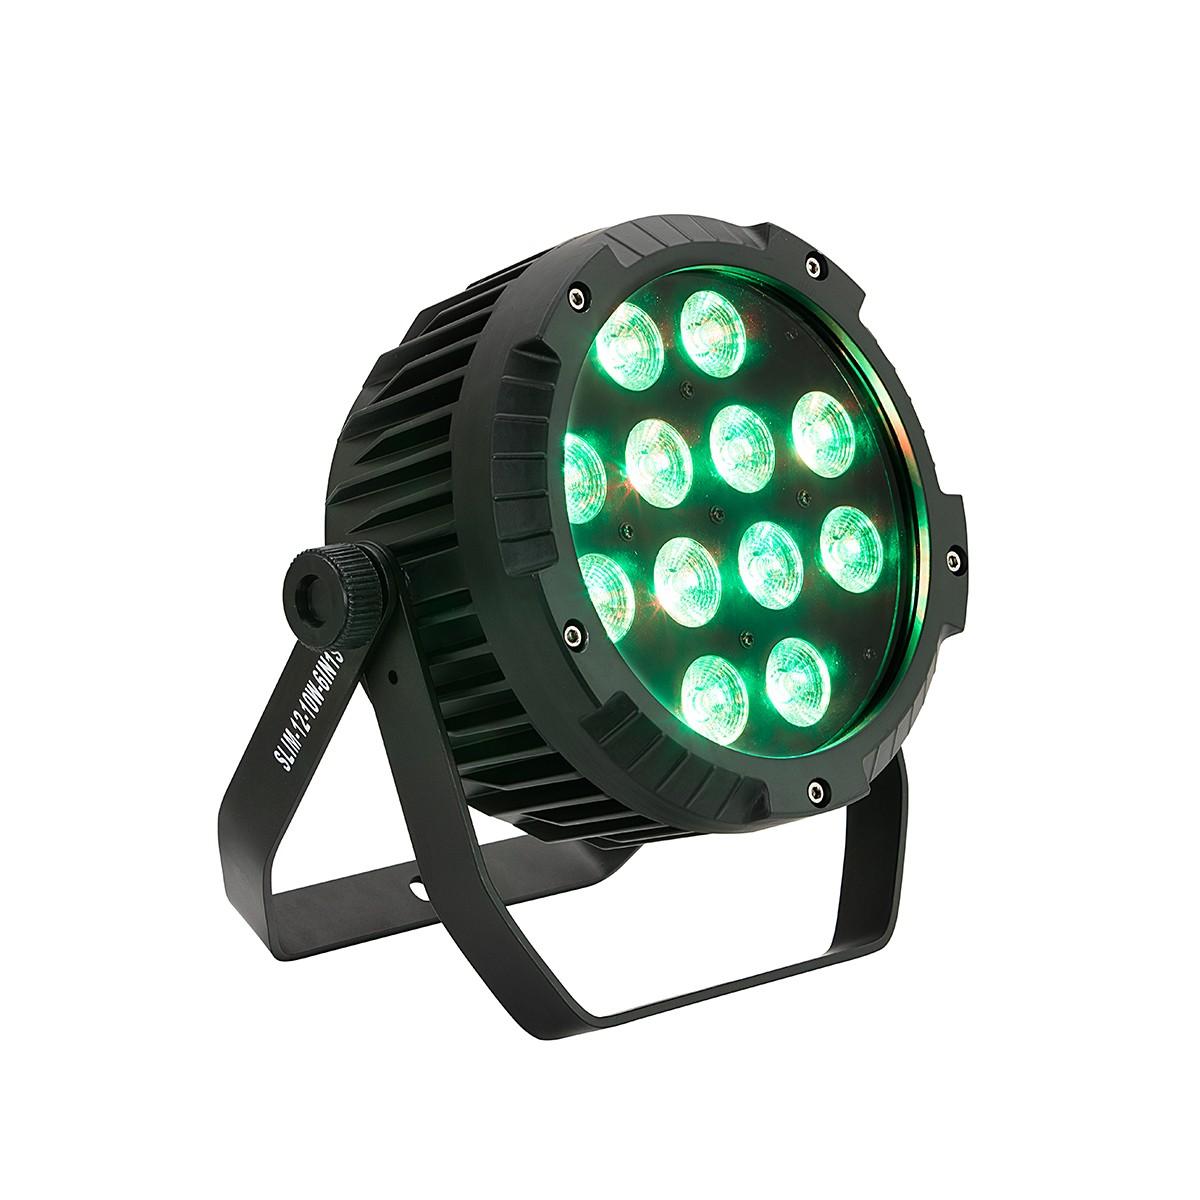 PROIETTORE A LED SOUNDSATION SESTETTO 1012 SLIM SILENT RGBWAV 6IN1